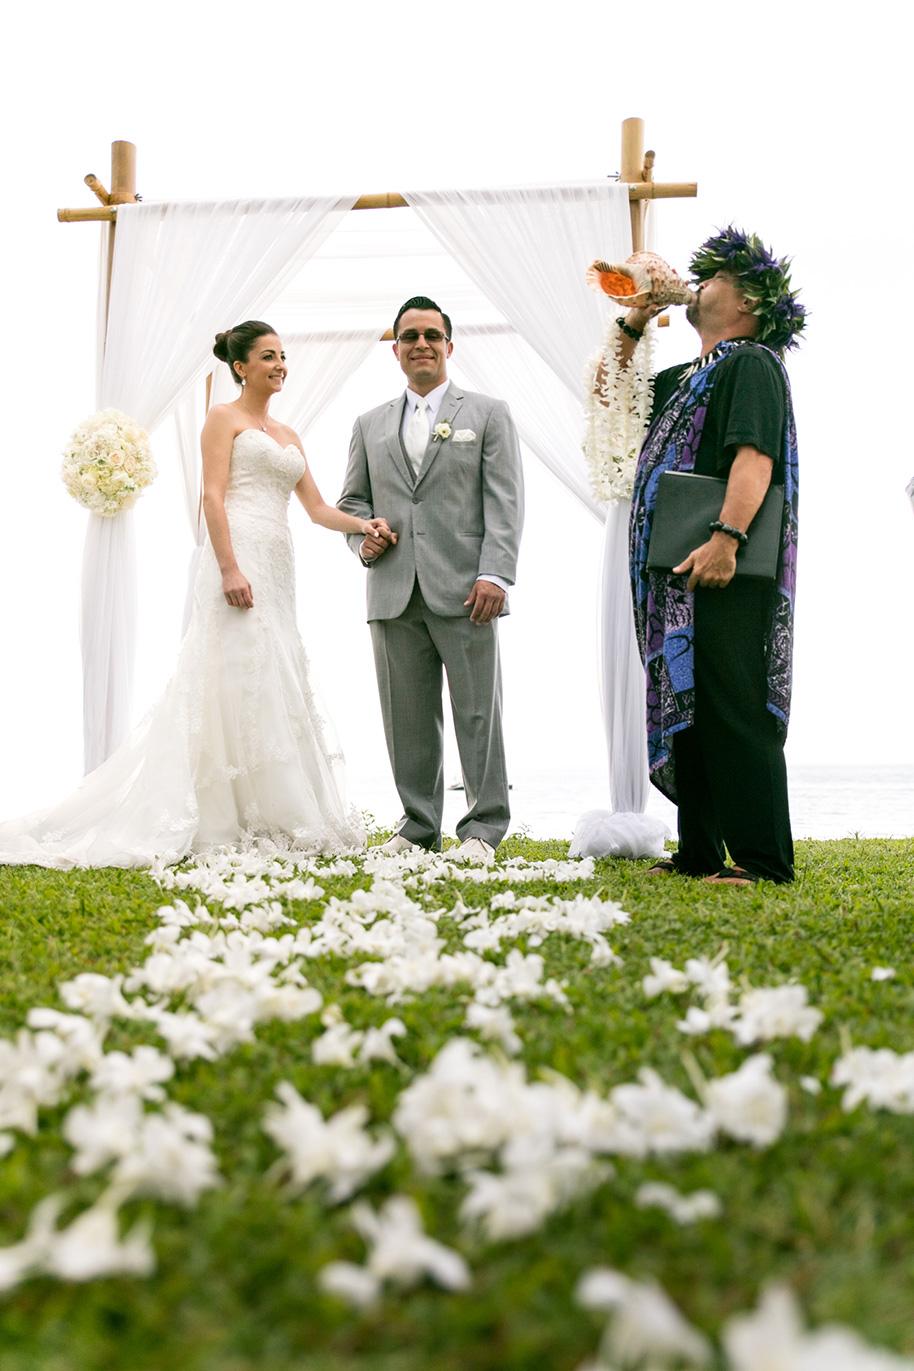 Maui-Ocean-Front-Wedding-070816-14